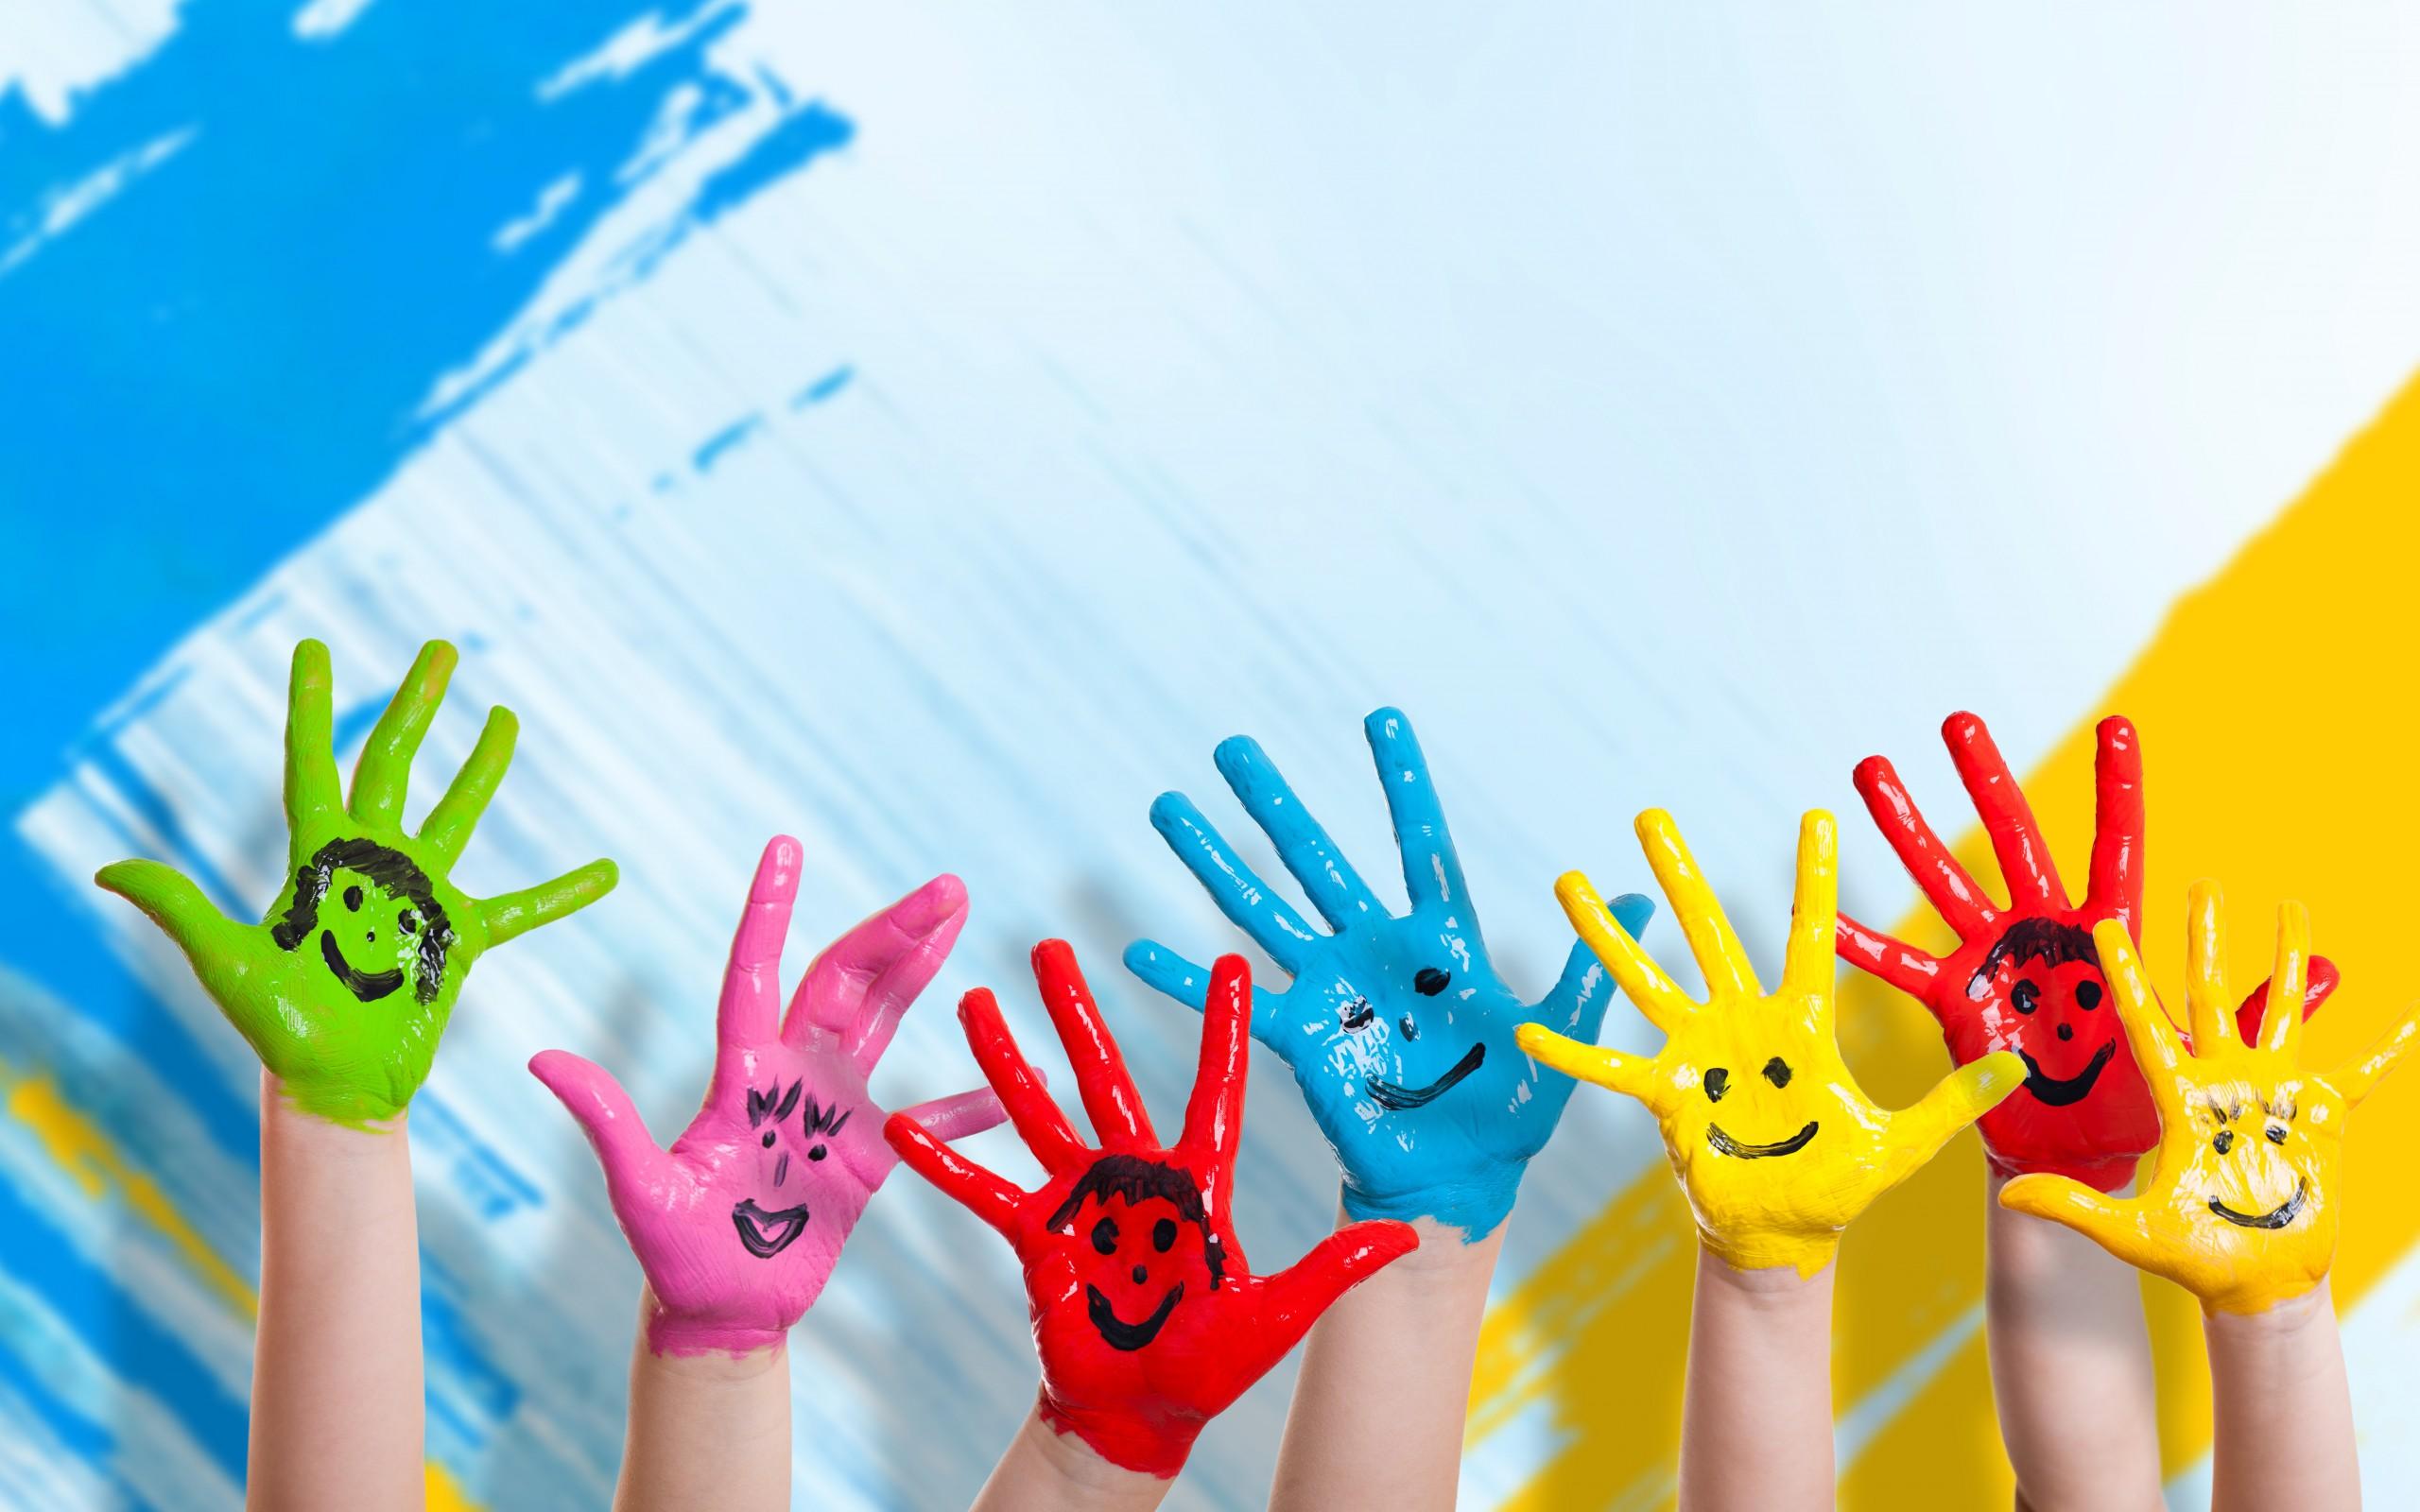 Child Computer Wallpapers Desktop Backgrounds 2560x1600 ID386620 2560x1600